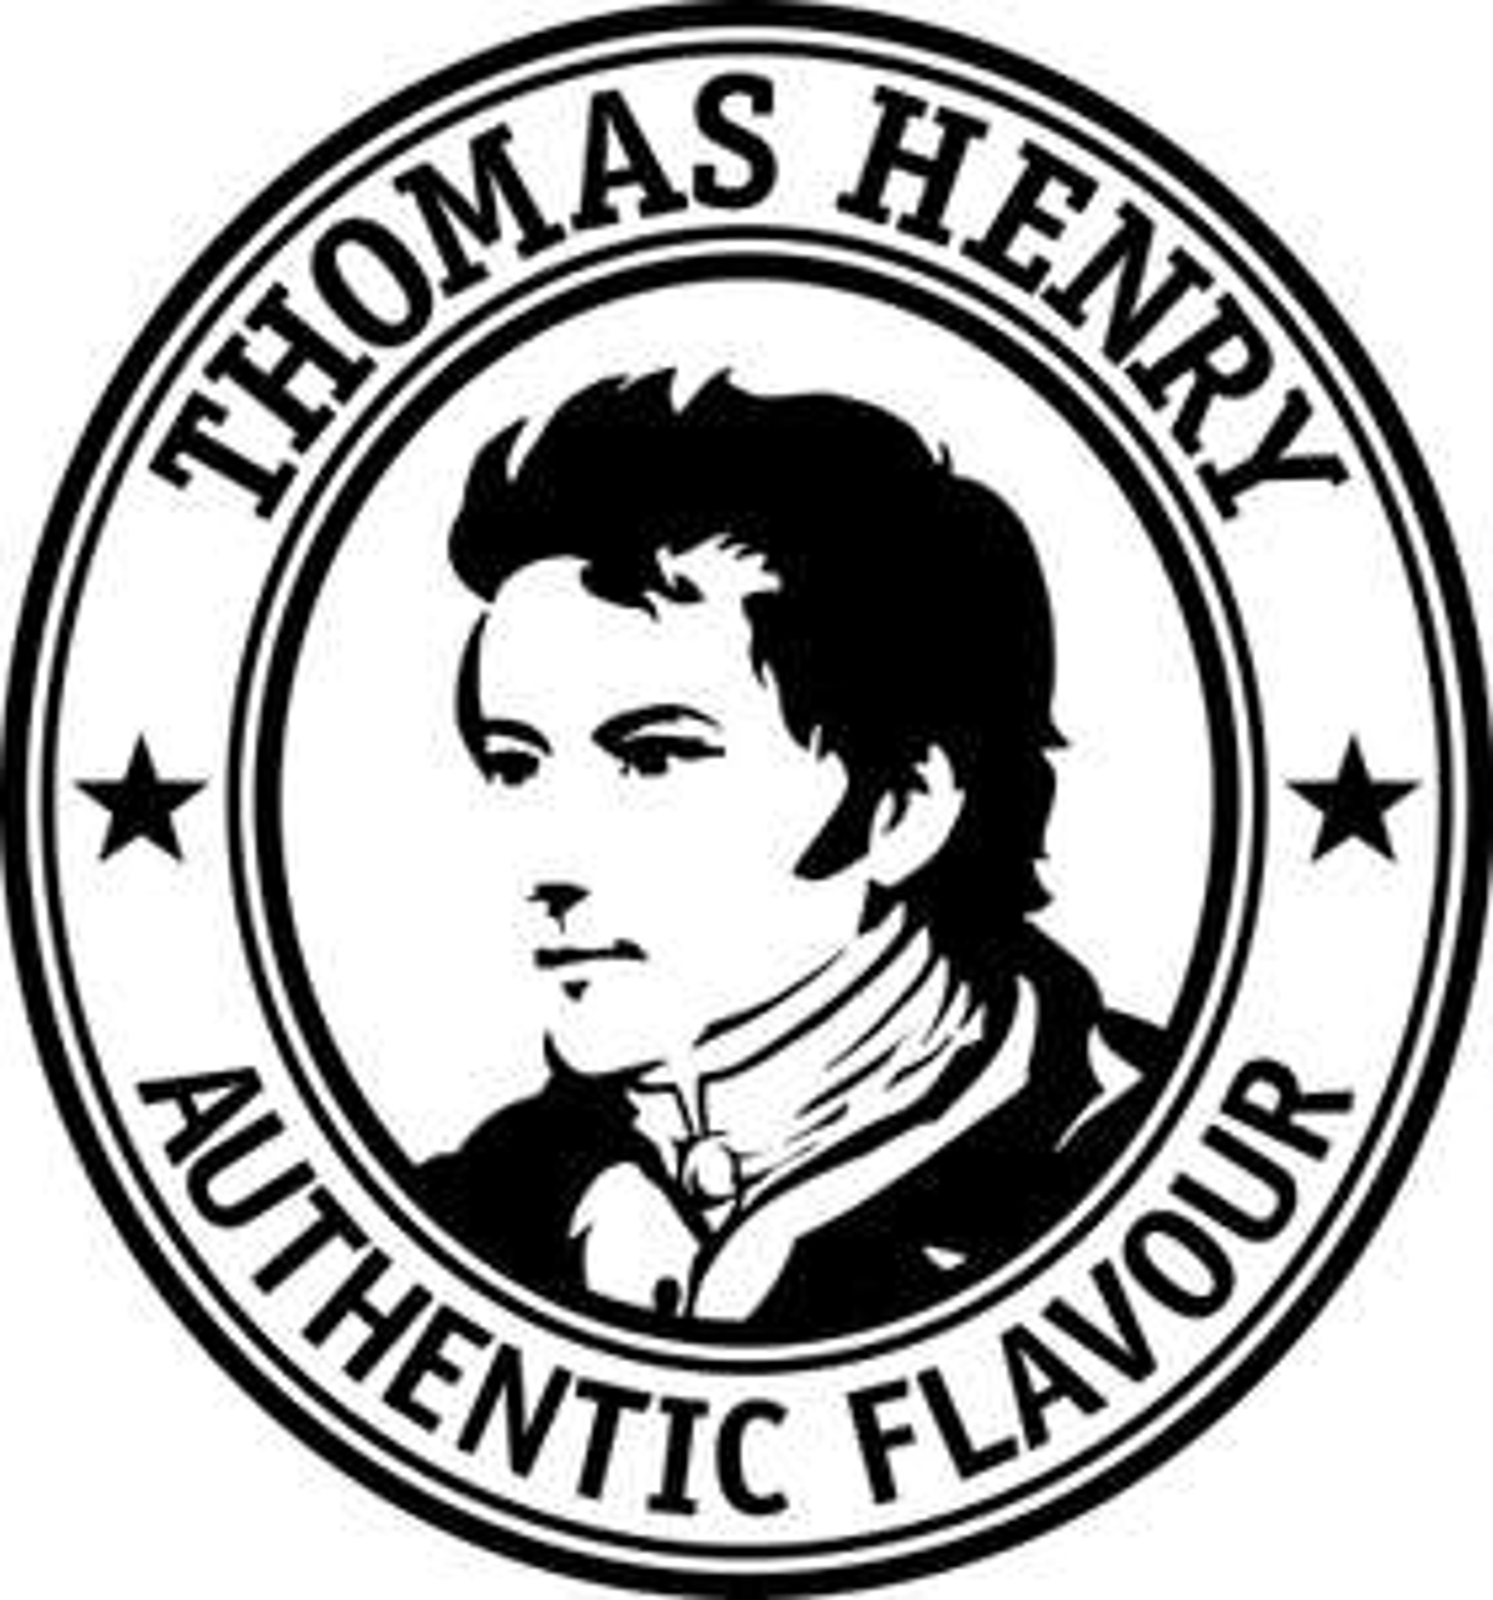 Thomas Henry, 0,75l Fl., versch. Sorten (u.a. Tonic Water, Bitter Lemon) für 1,19 € (zzgl. Pfand) @ Kaufland bundesweit ab 02.08.